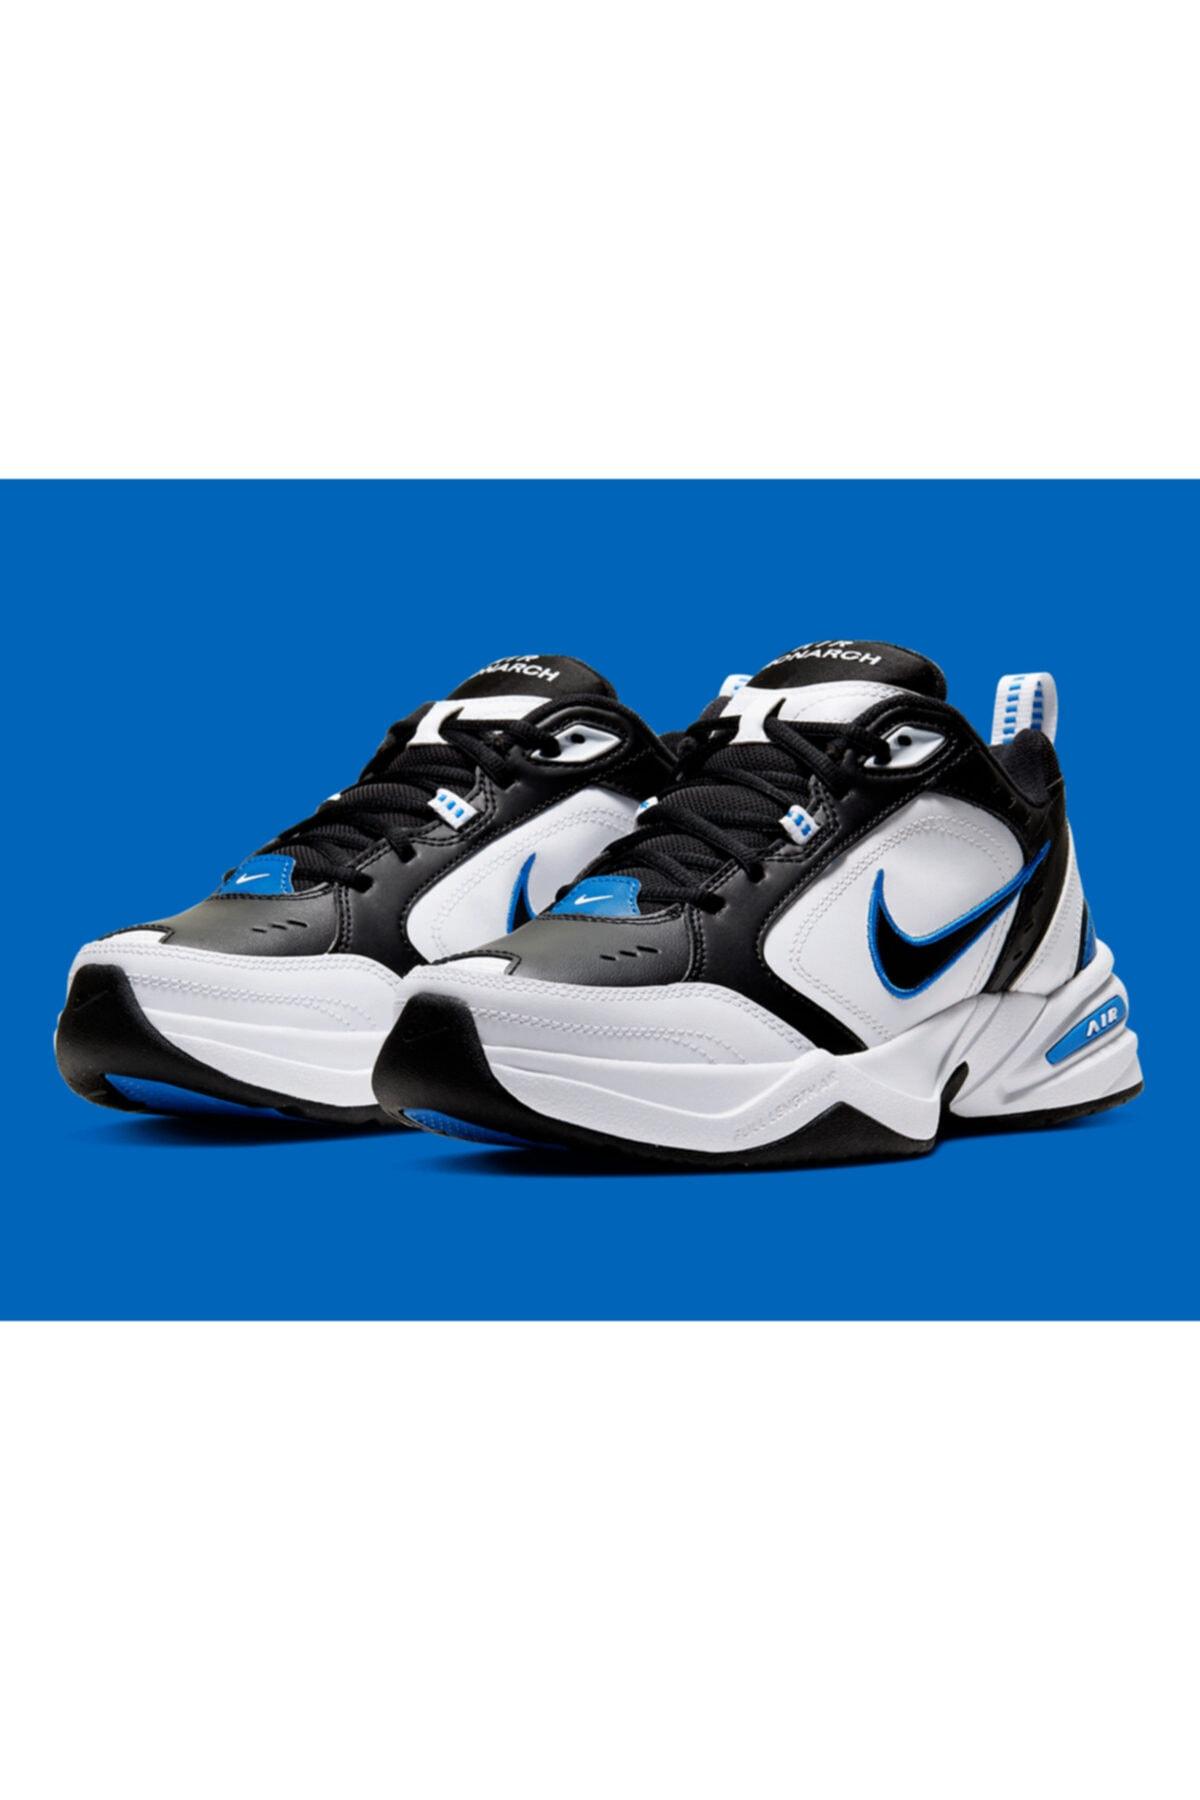 Nike Air Monarch Iv 4 Siyah Beyaz Mavi Retro Unisex Sneaker Ayakkabı 415445-002 1